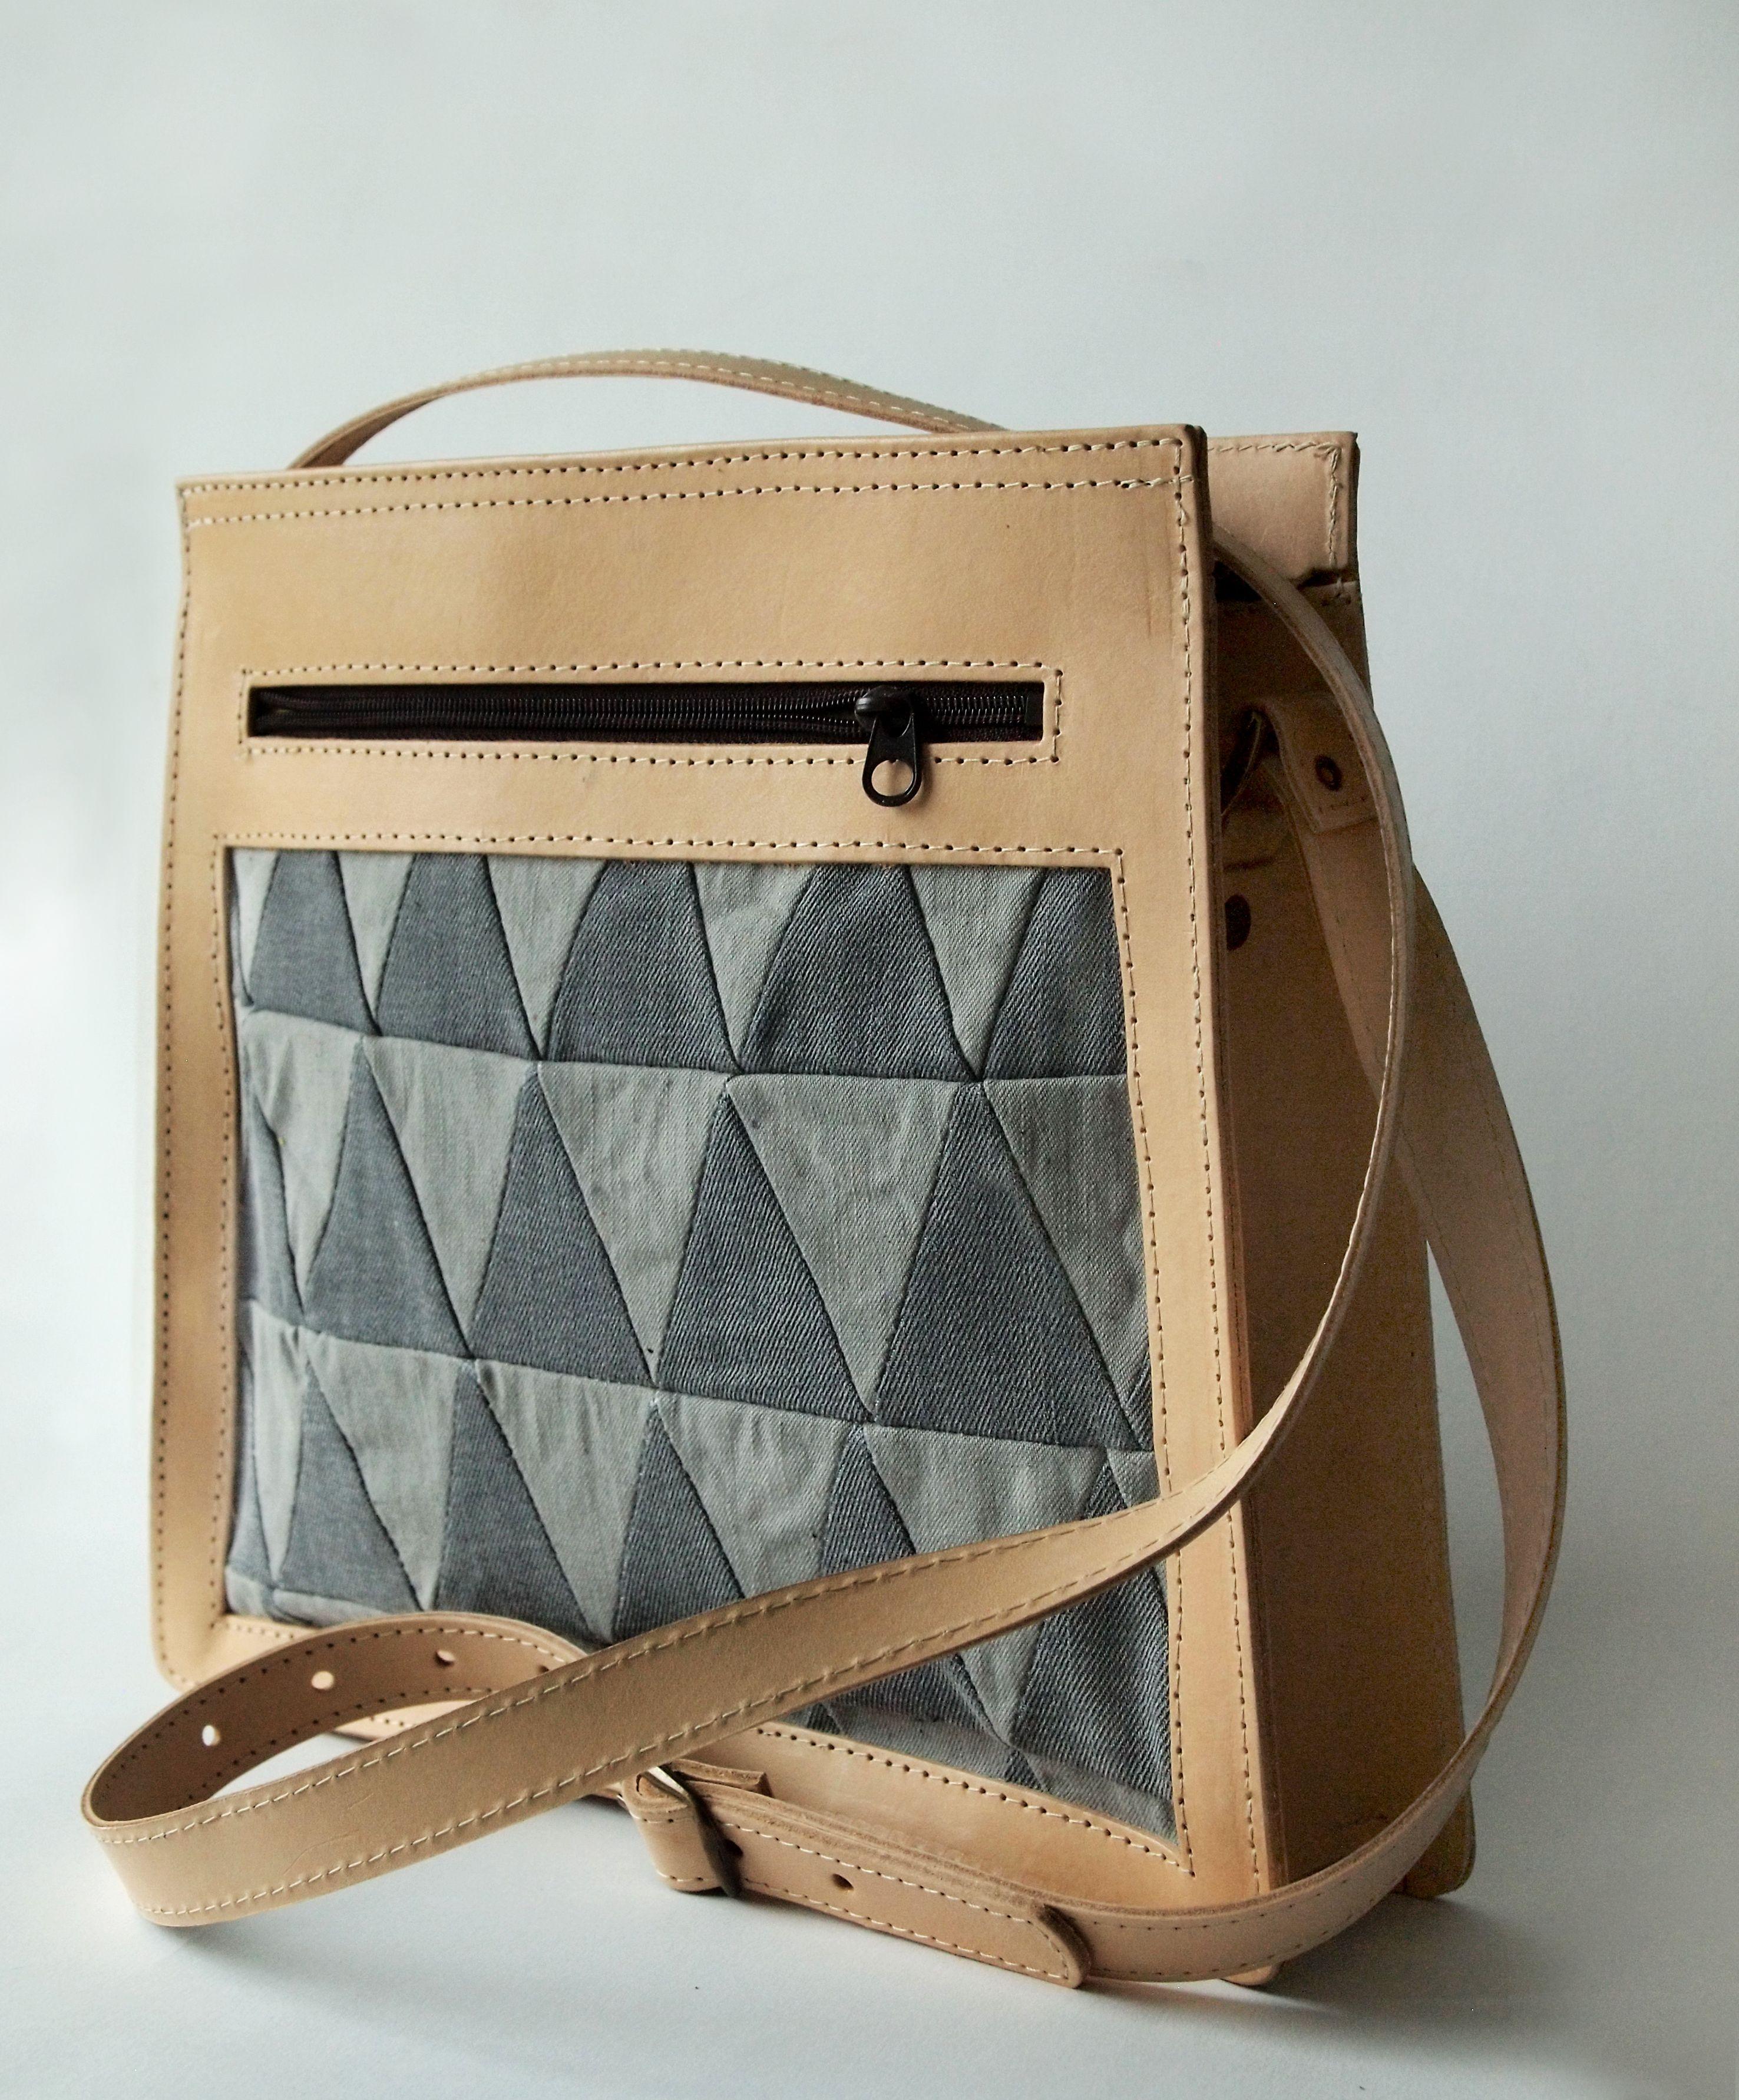 Around Collective/Mocklis Bag of recykeld material. Slow fashion, denim, re-design